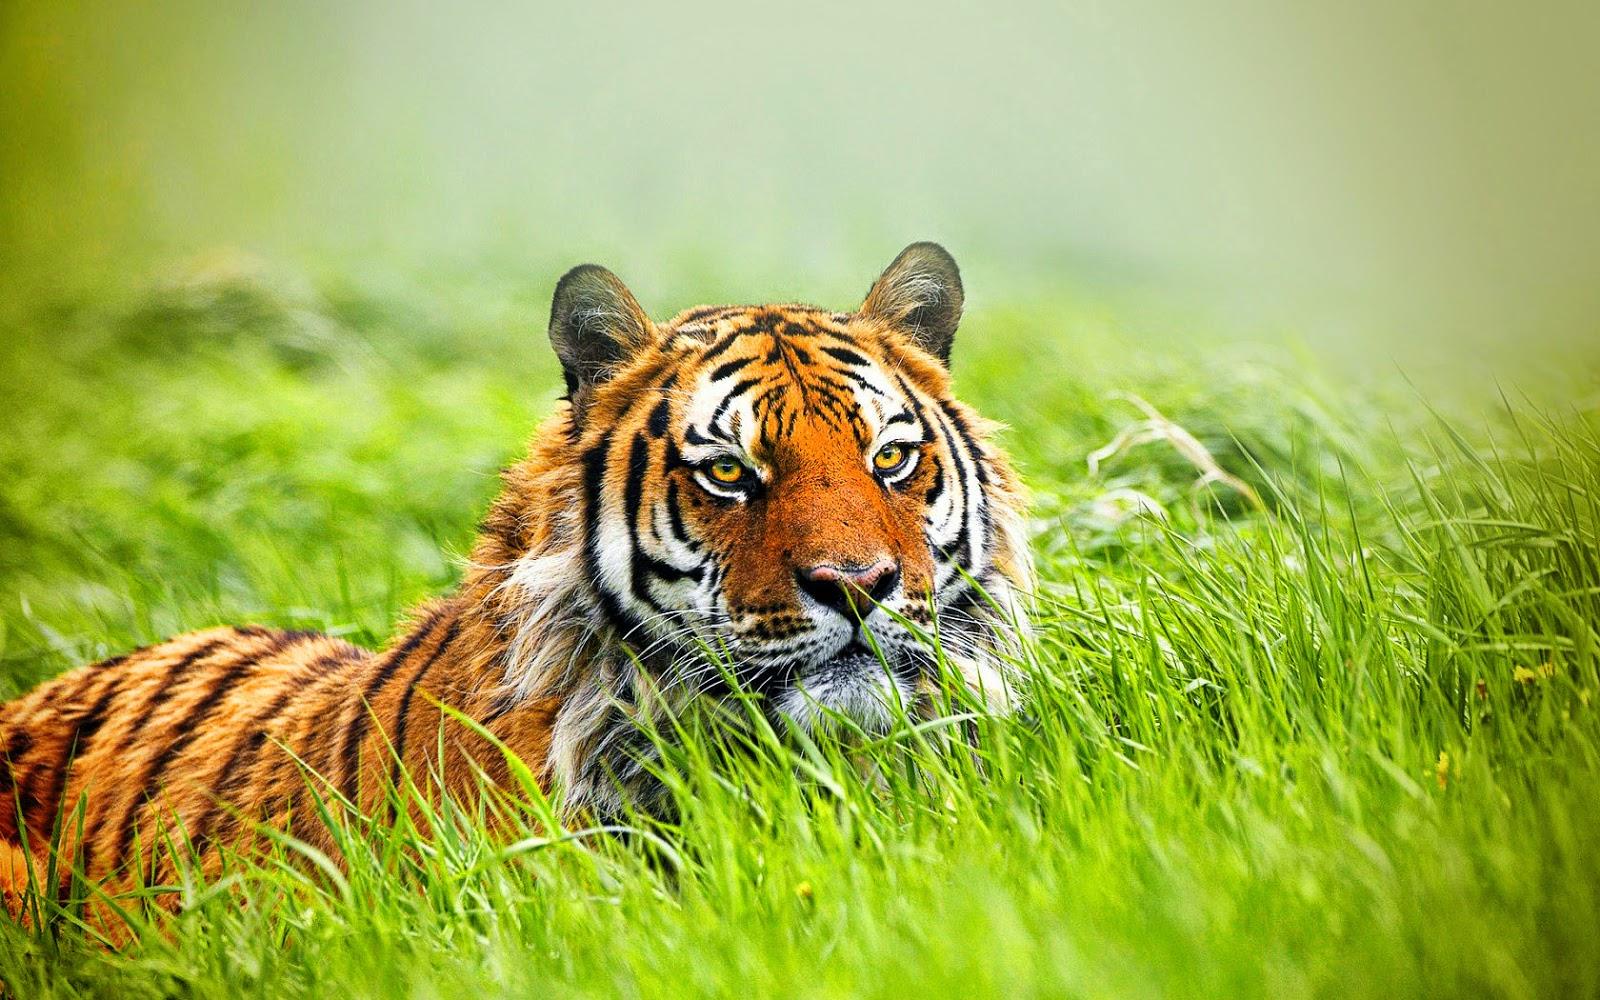 desktop wallpaper waiting tiger | desktop wallpaper